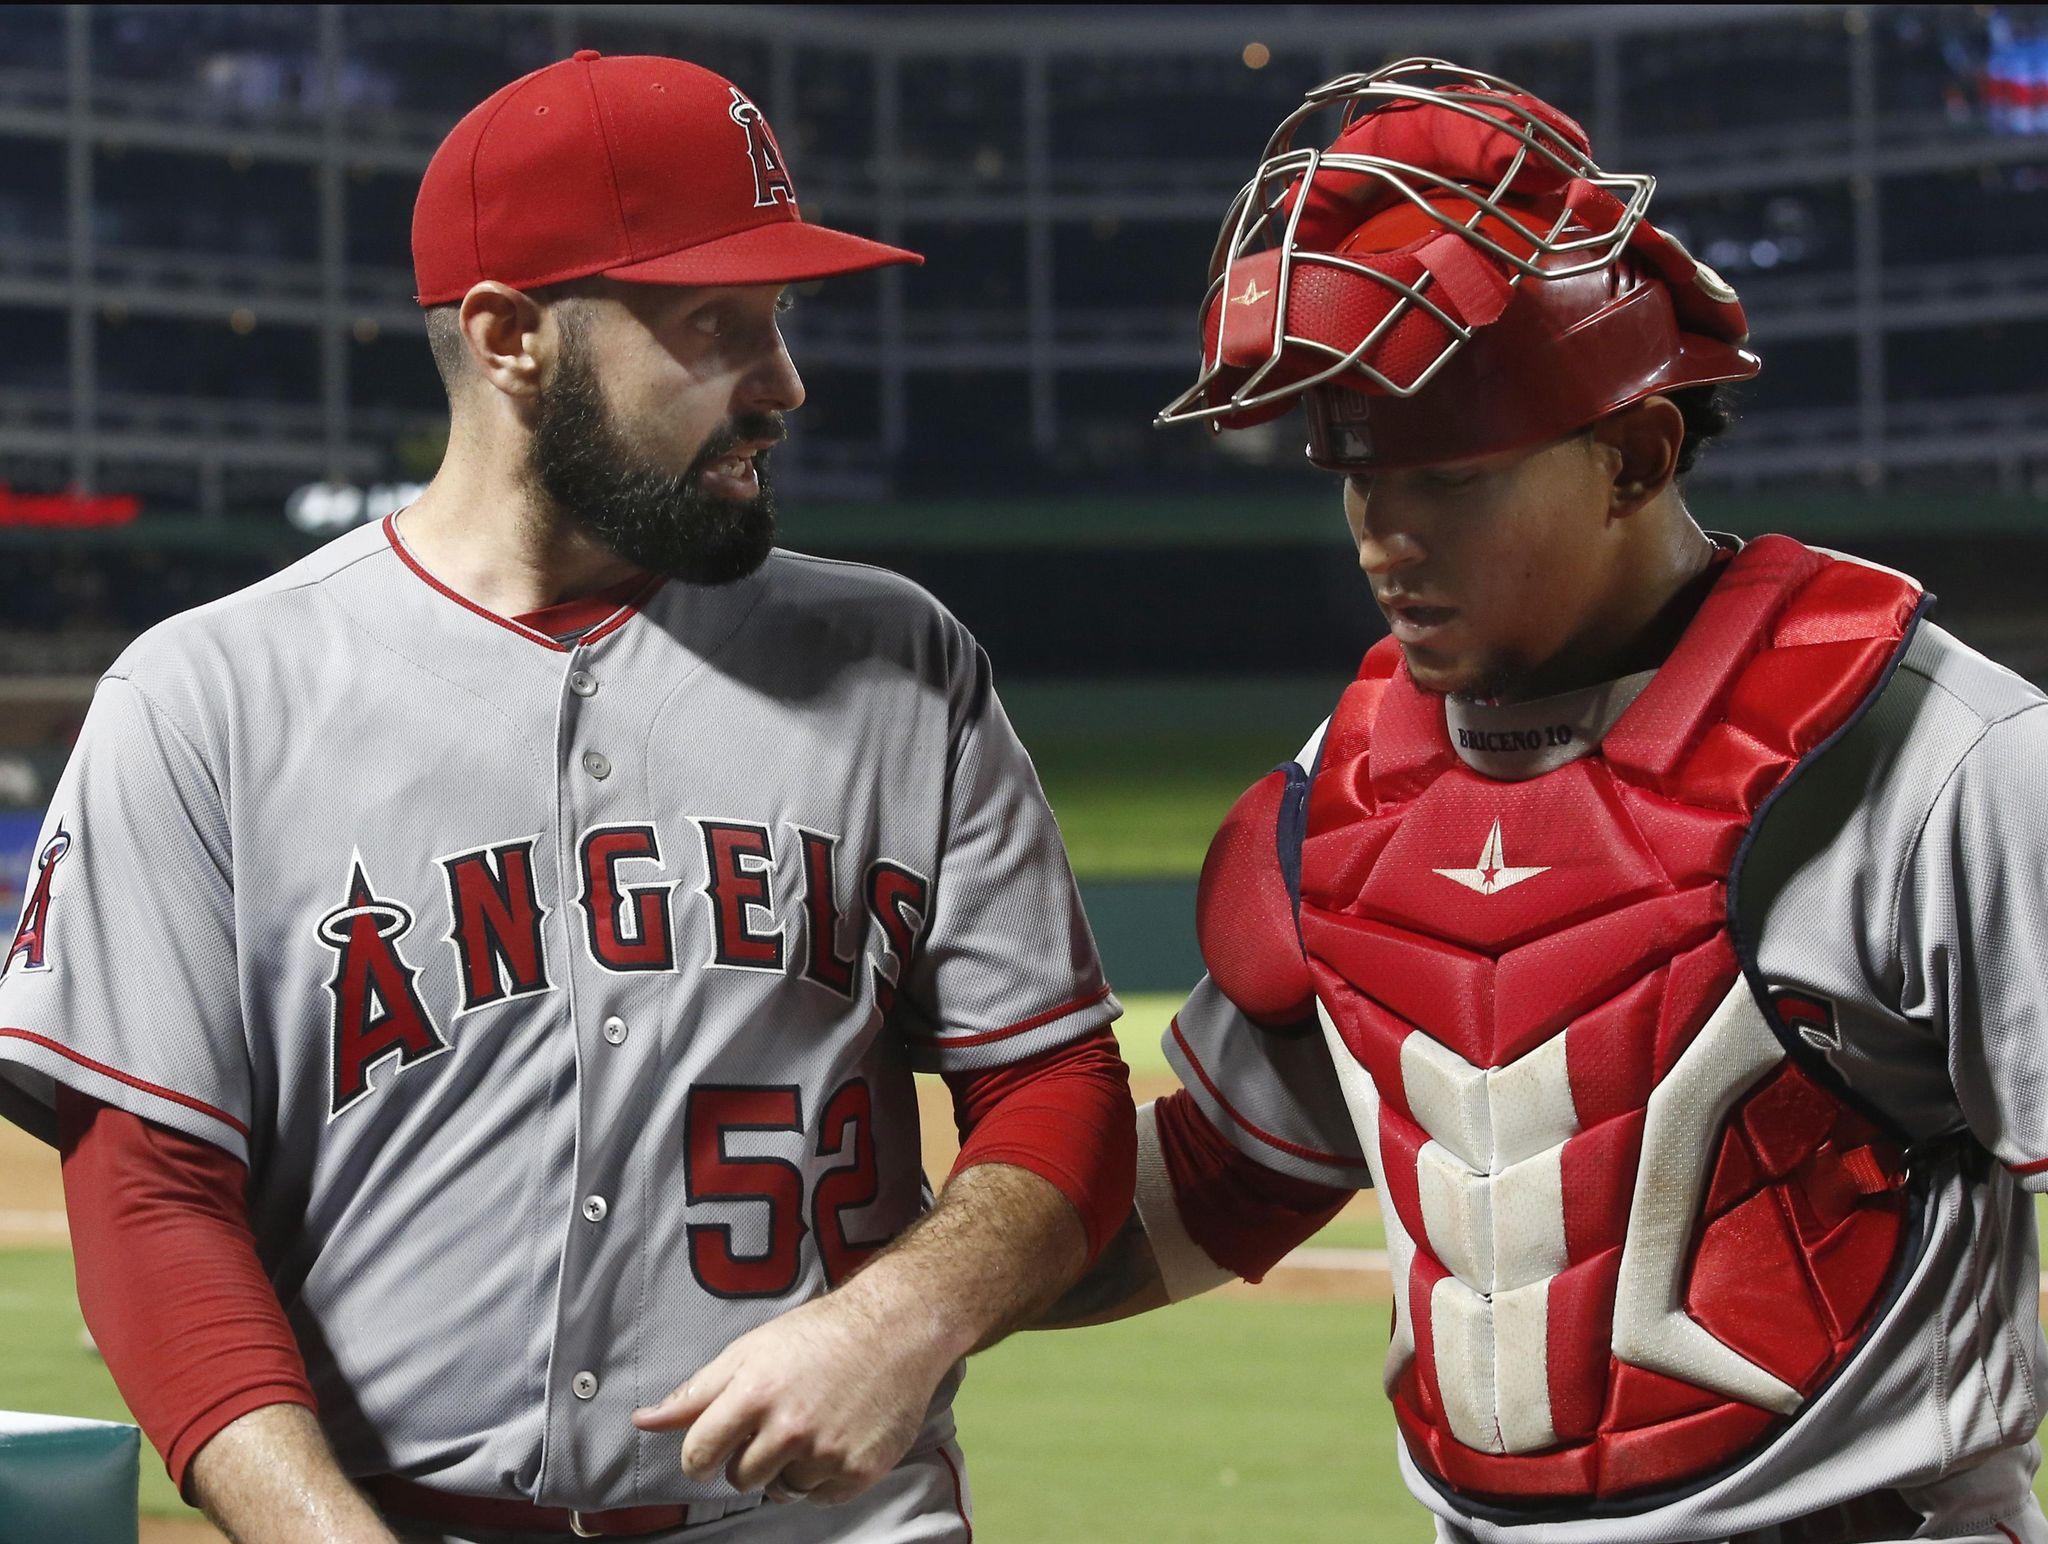 Angels_rangers_baseball_54444_s2048x1544